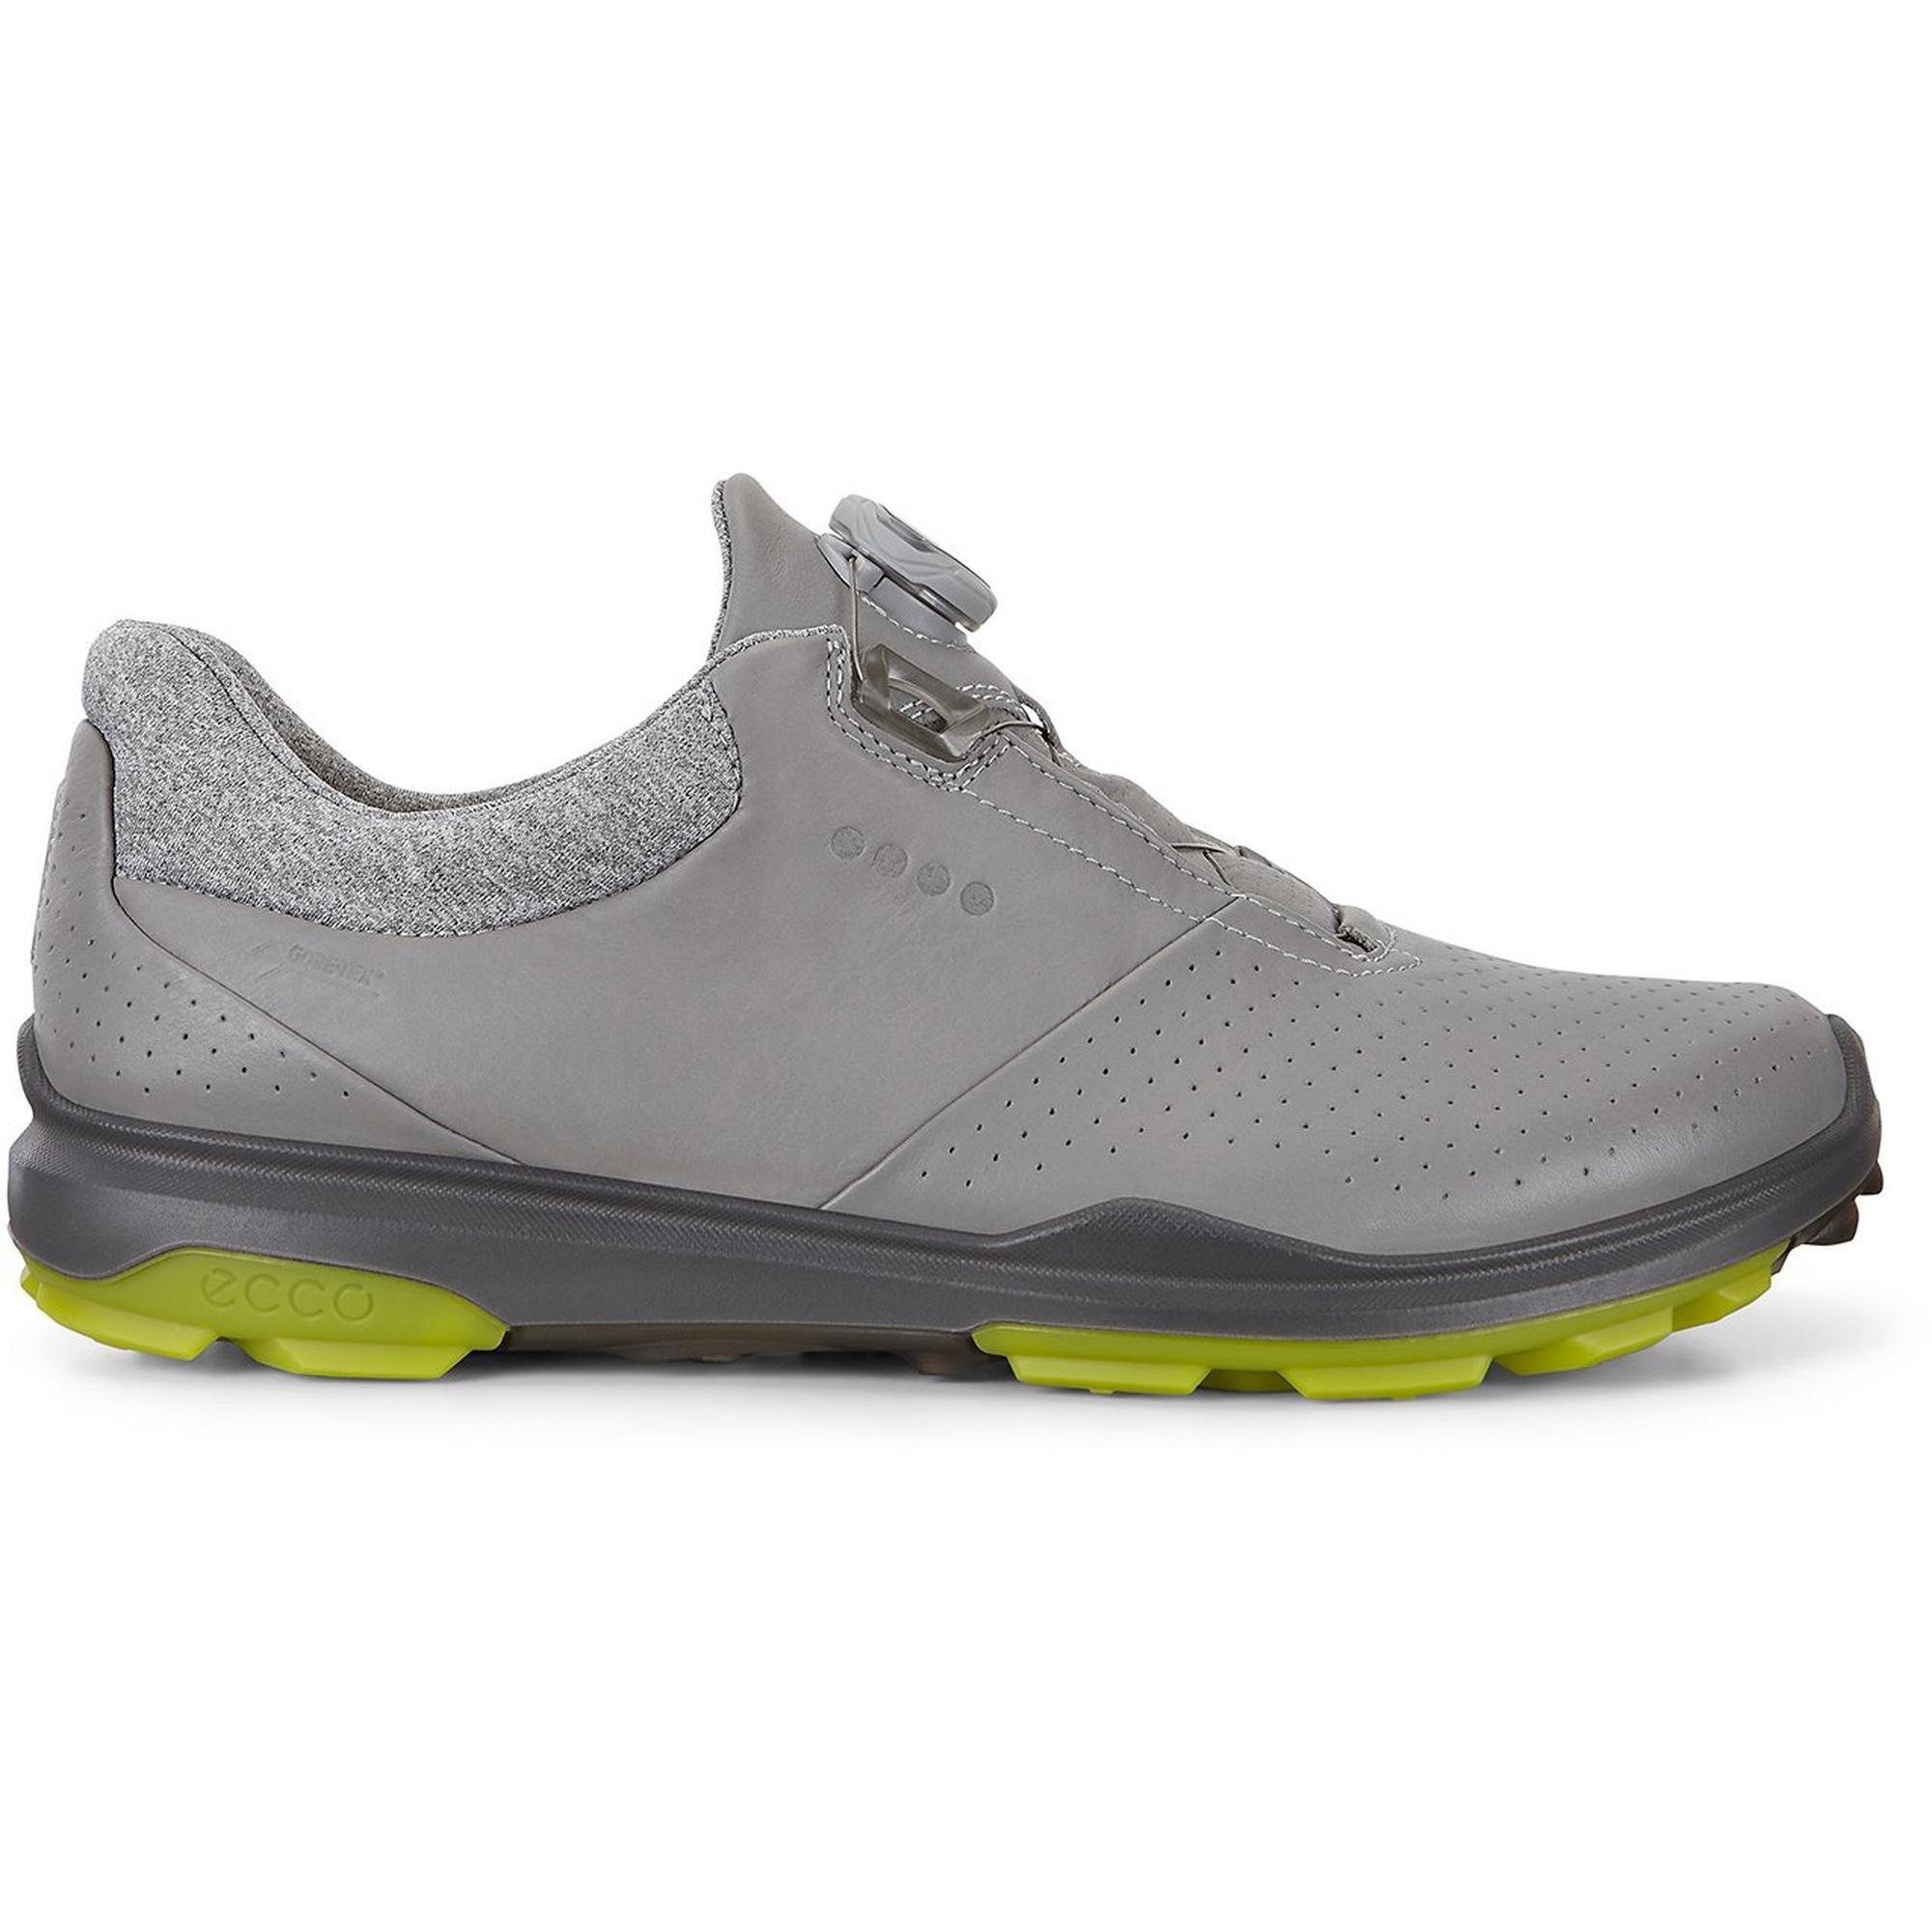 25b3a06ea1 Mens Goretex Biom Hybird 3 Boa Spikeless Golf Shoe - LTGRY/GRN